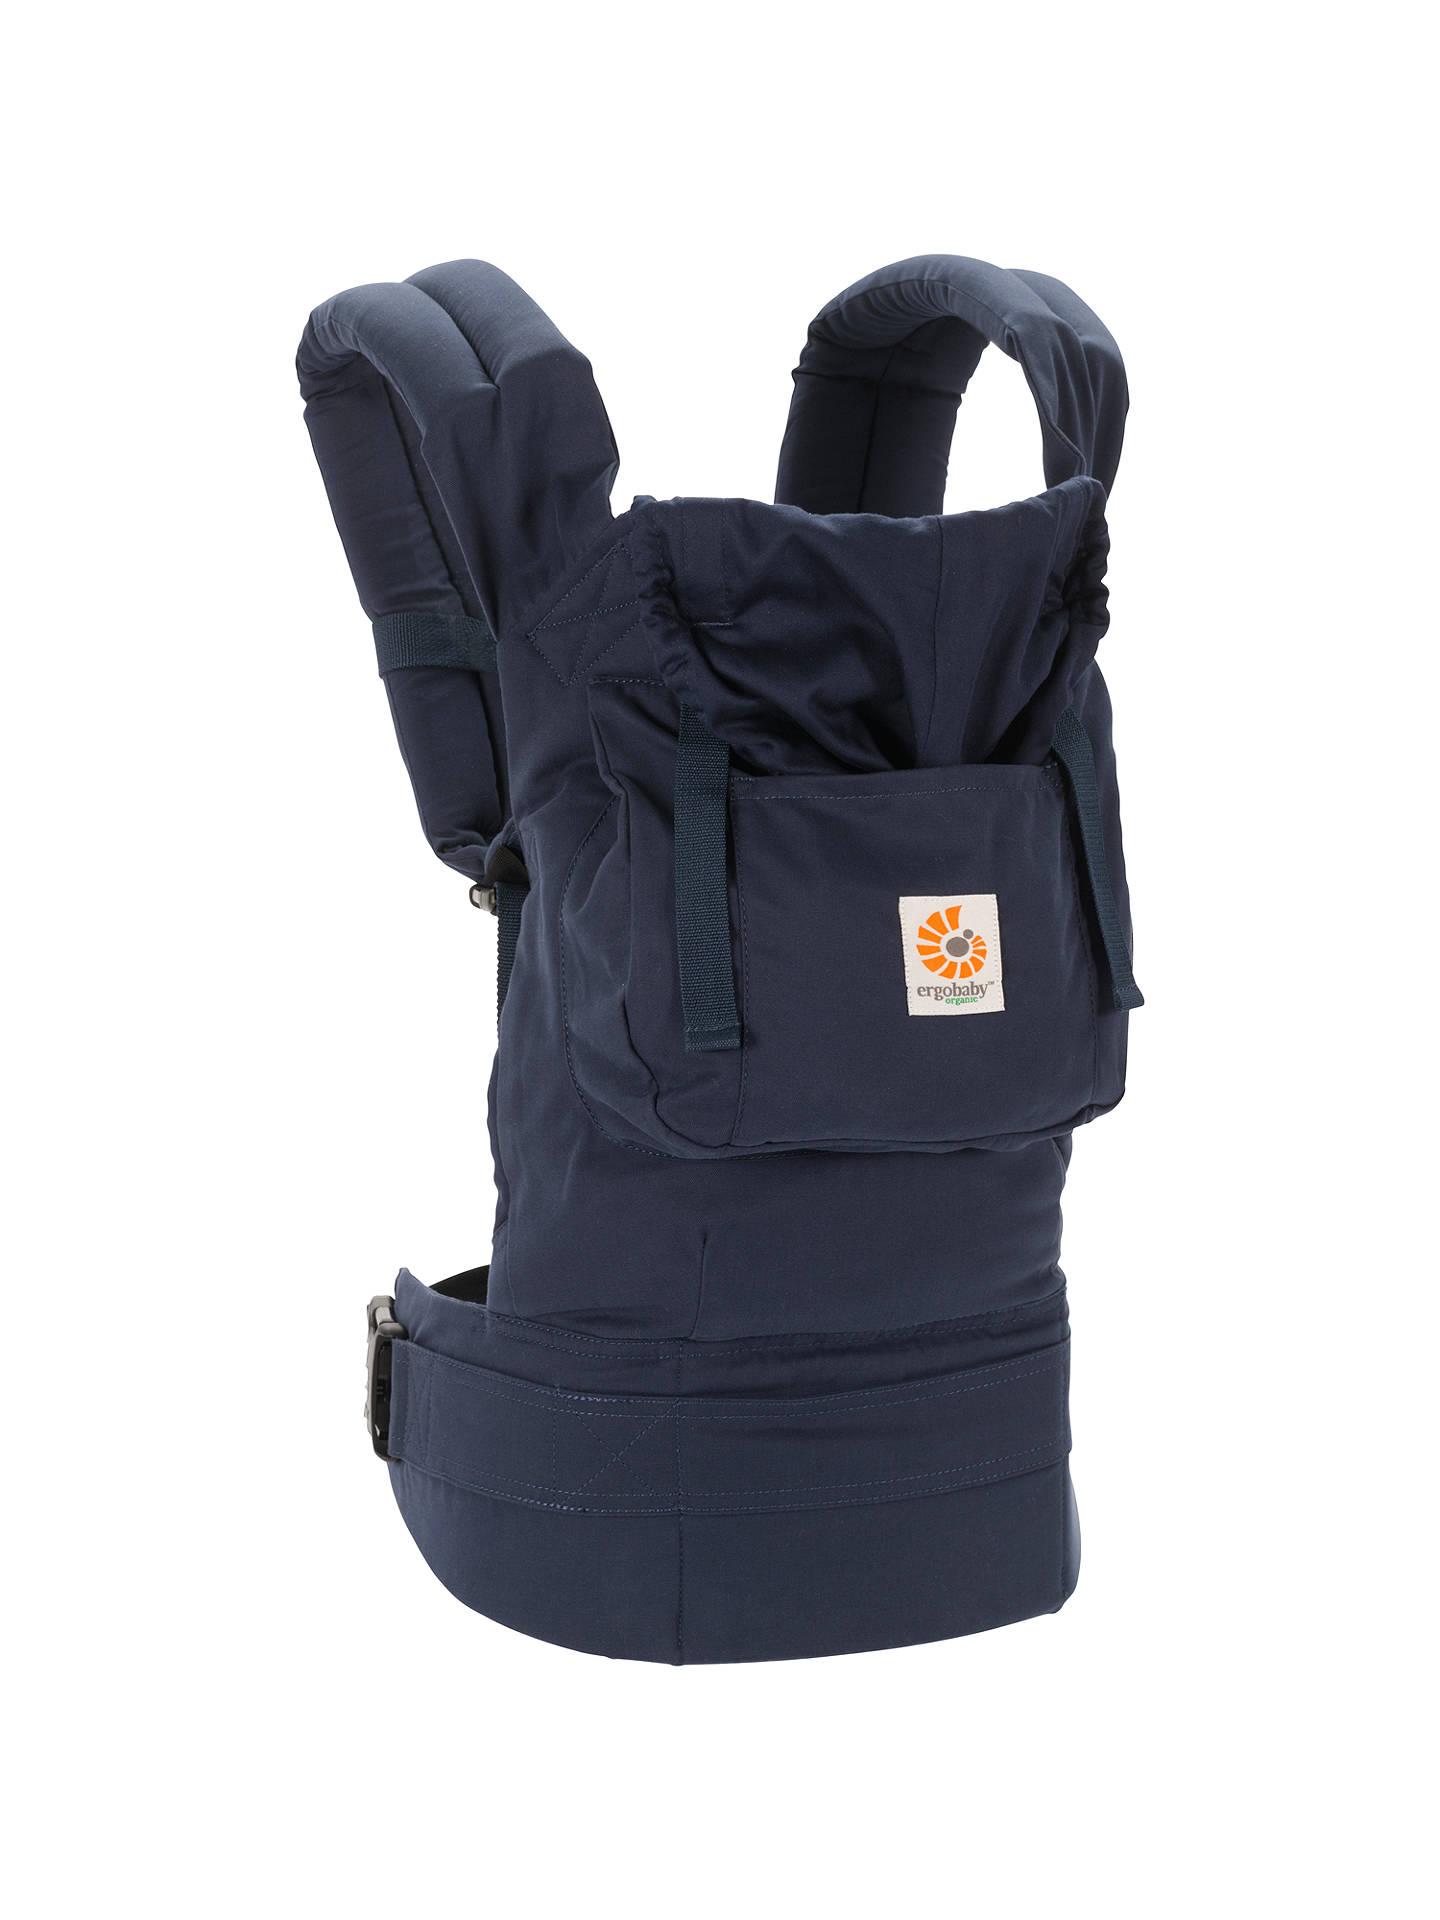 ... Buy Ergobaby Organic Bundle Of Joy Baby Carrier